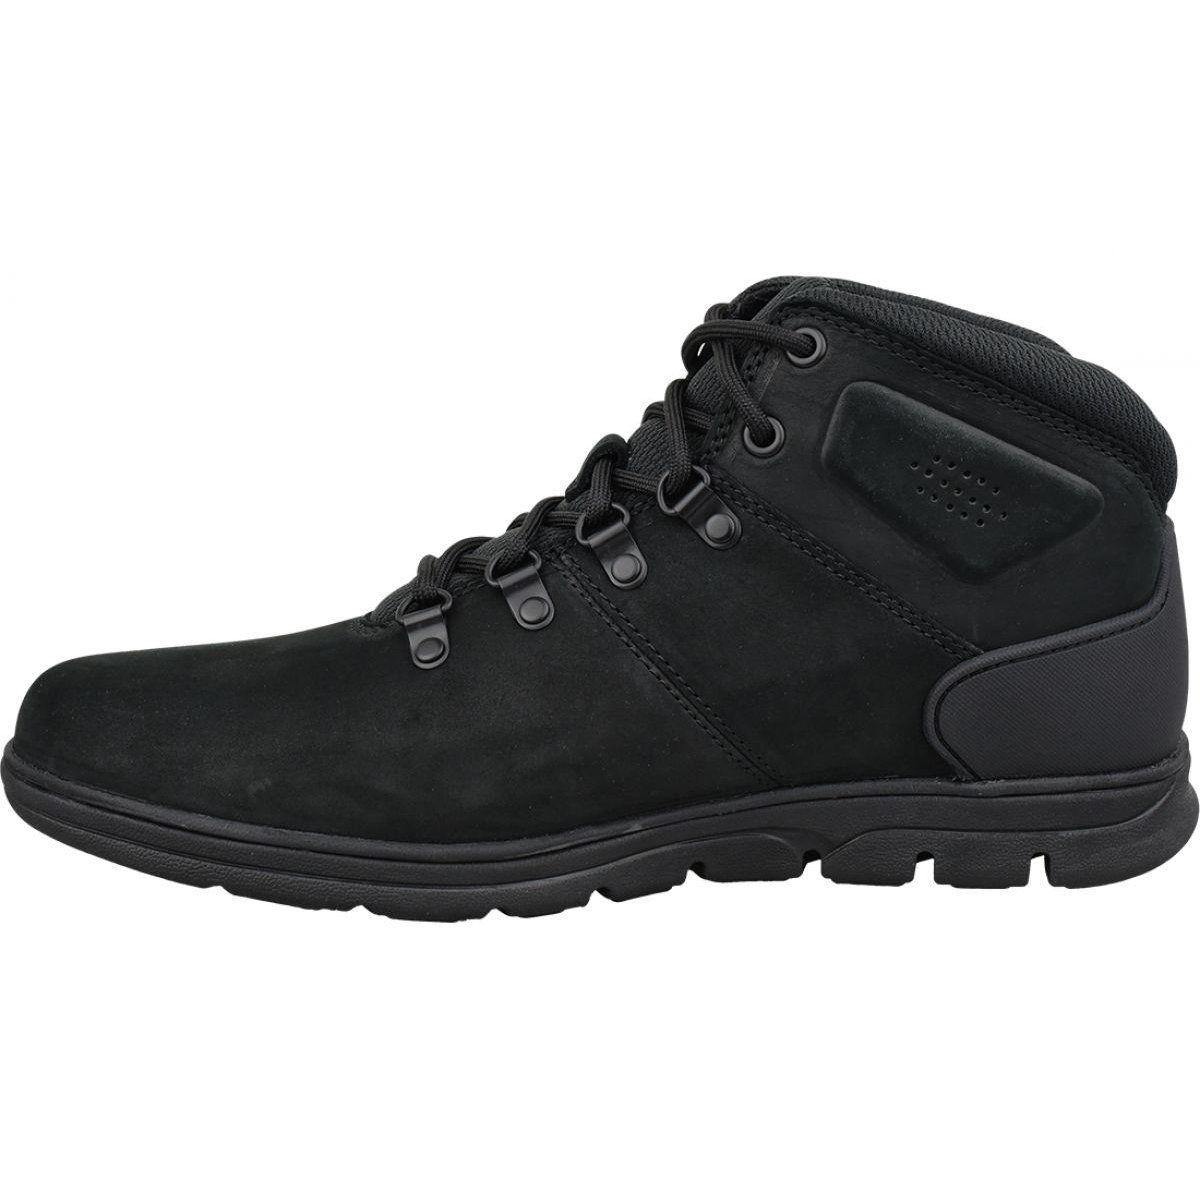 Buty Timberland Bradstreet Hiker M A26zb Czarne Timberlands Shoes Sport Shoes Men Black Shoes